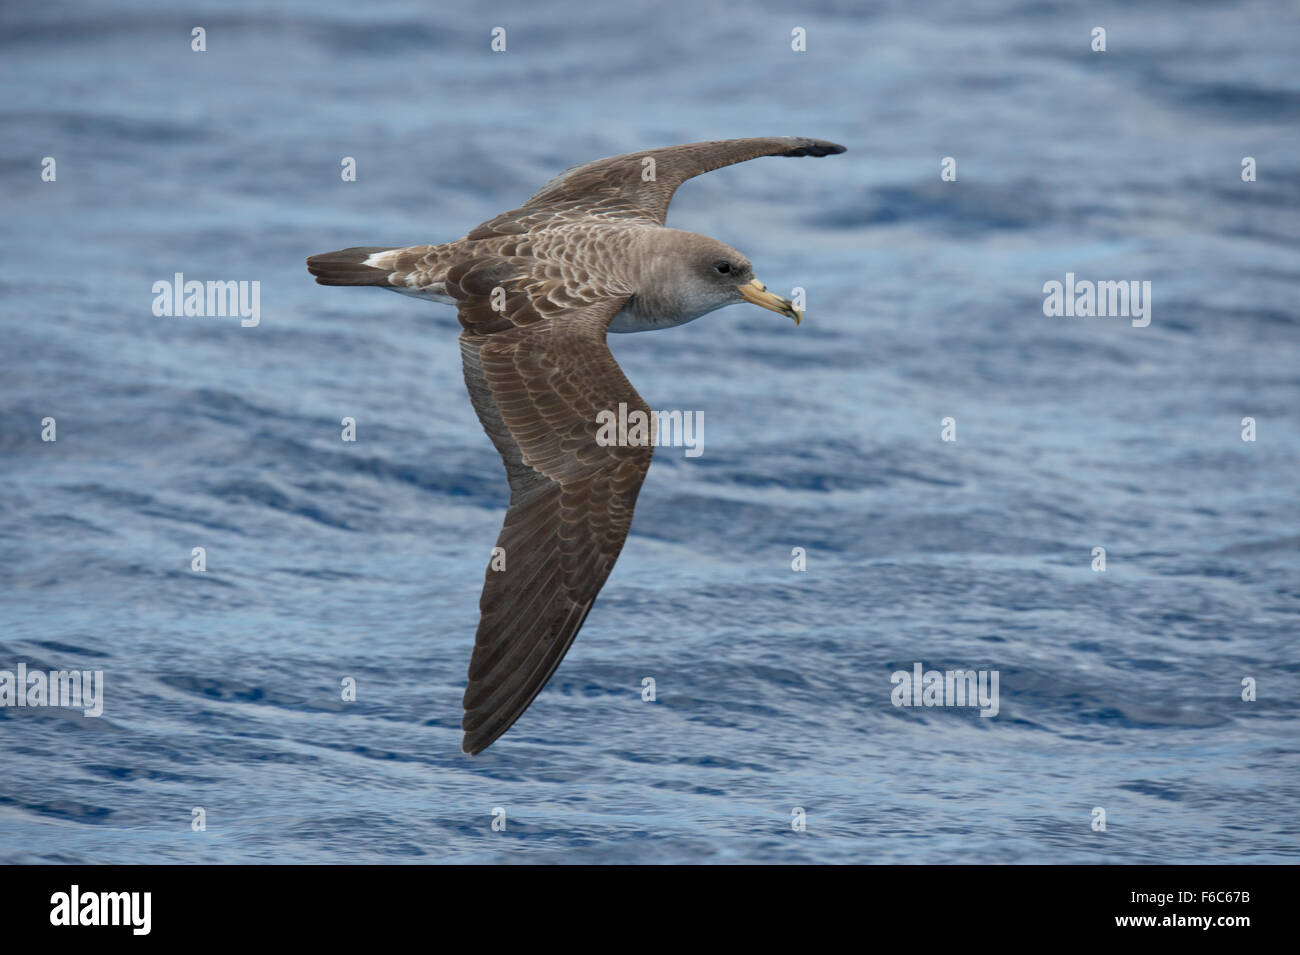 Cory's Shearwater, Calonectris diomedea, gliding over ocean, Pico, Azores, North Atlantic Ocean - Stock Image